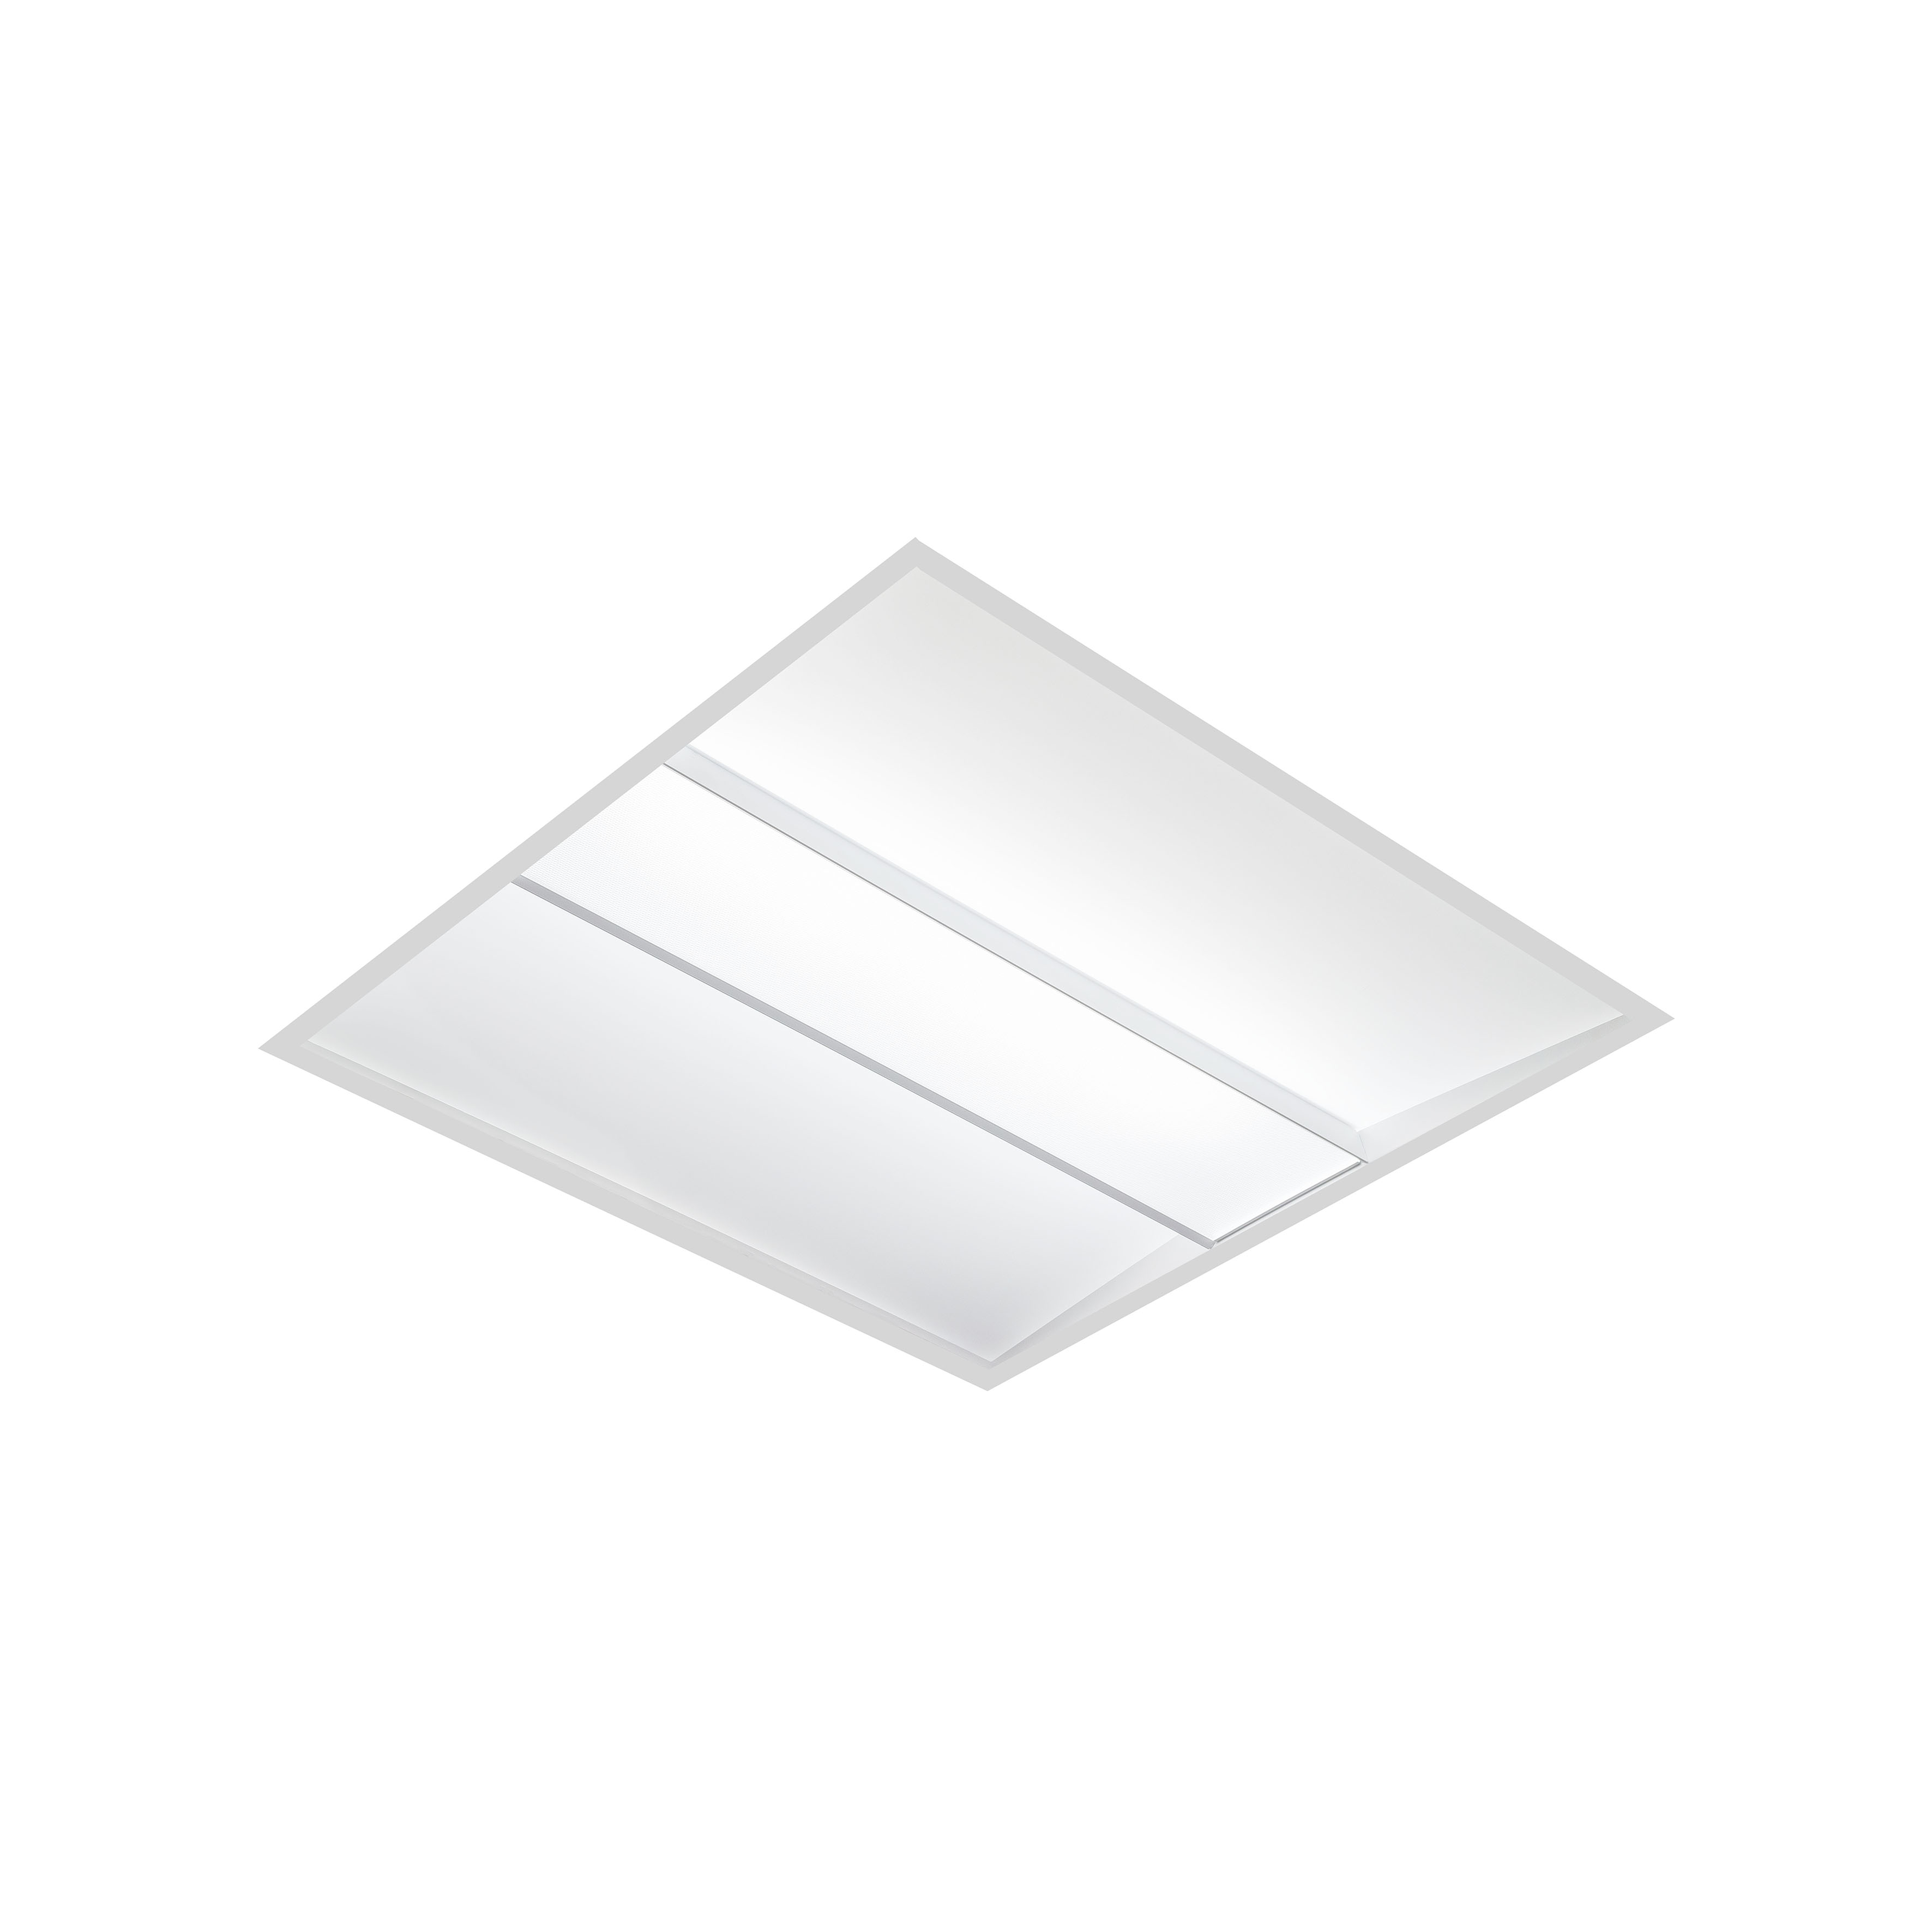 Quadrato Angled.jpg